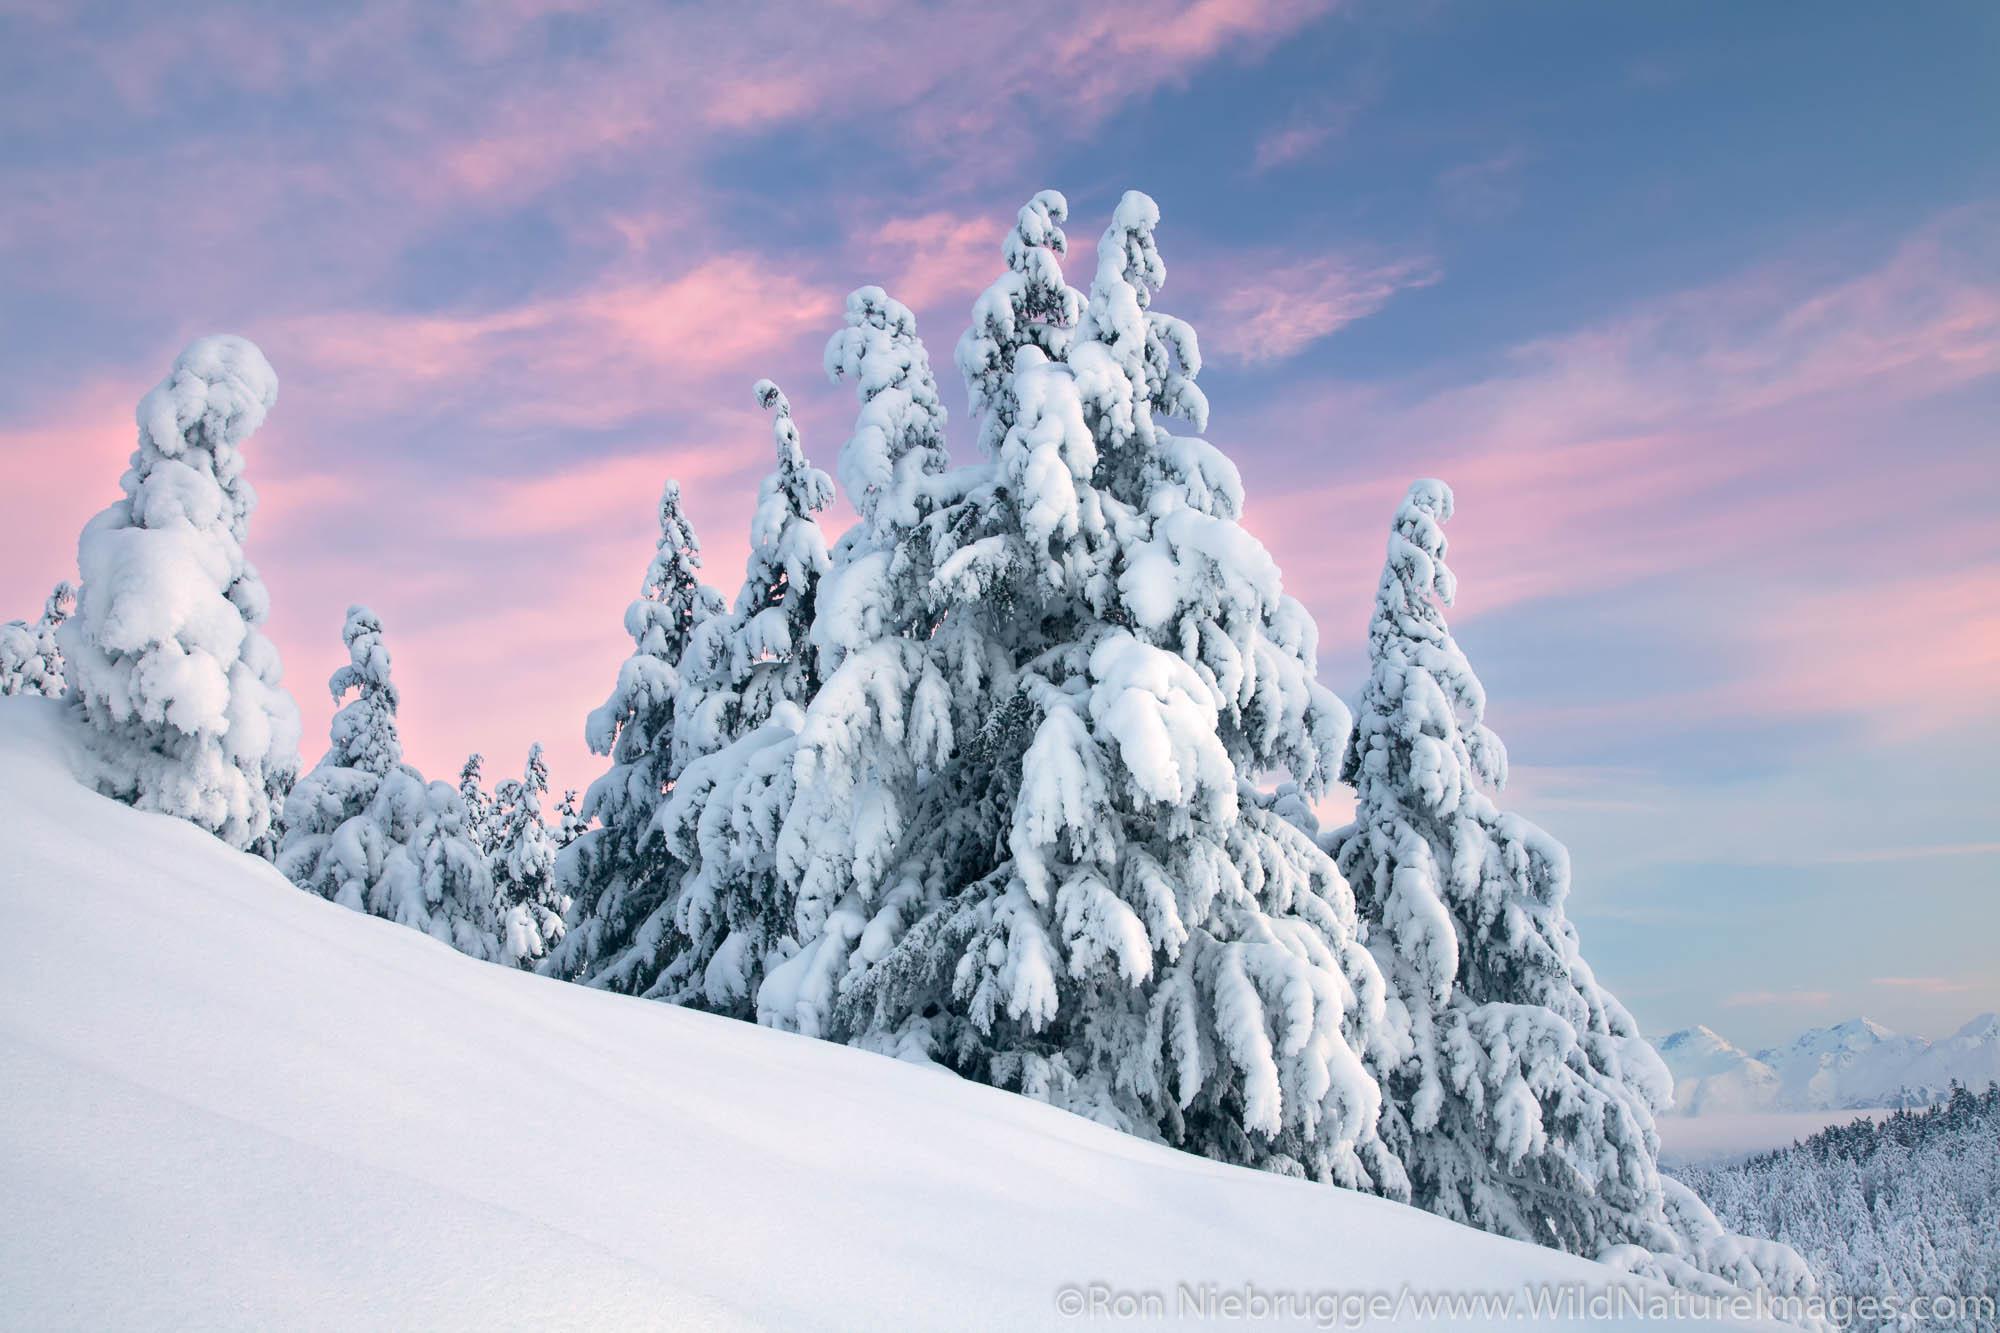 Chugach National Forest, Alaska Chugach, Turnagain Pass, Winter, photo